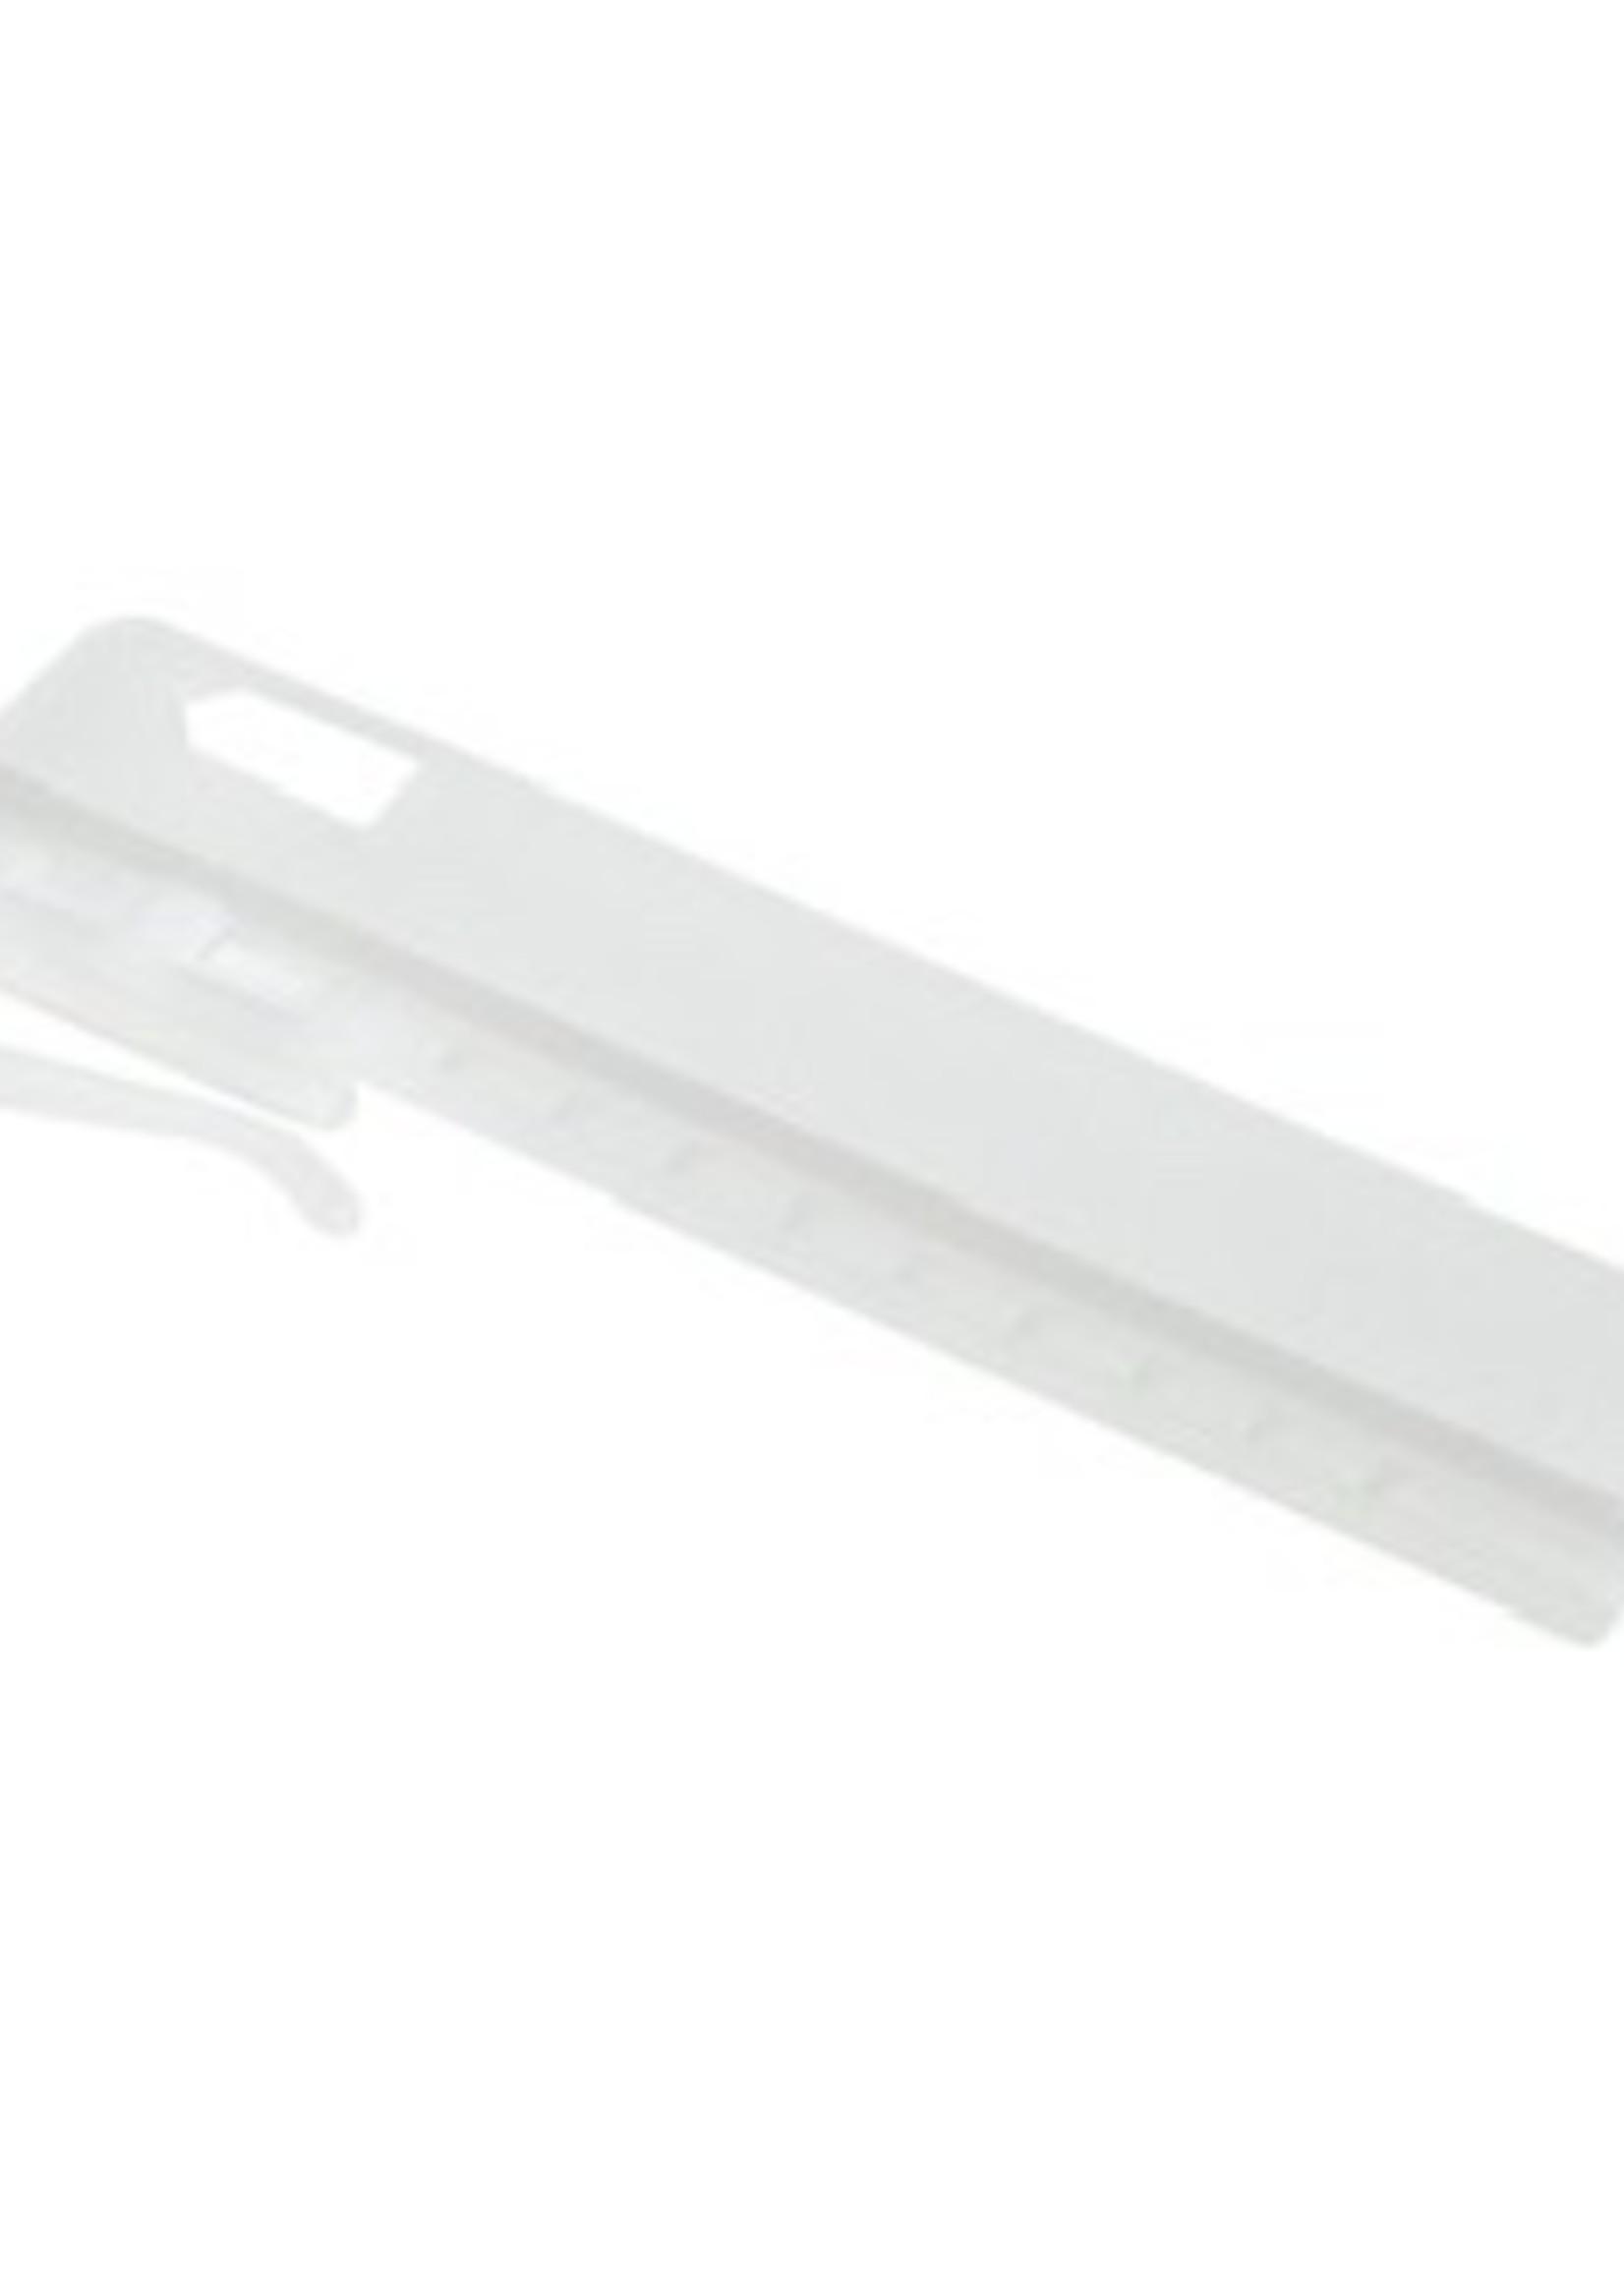 Microflex Innaai verstelbare gordijnhaak 5cm  verpakt per 200 stuks